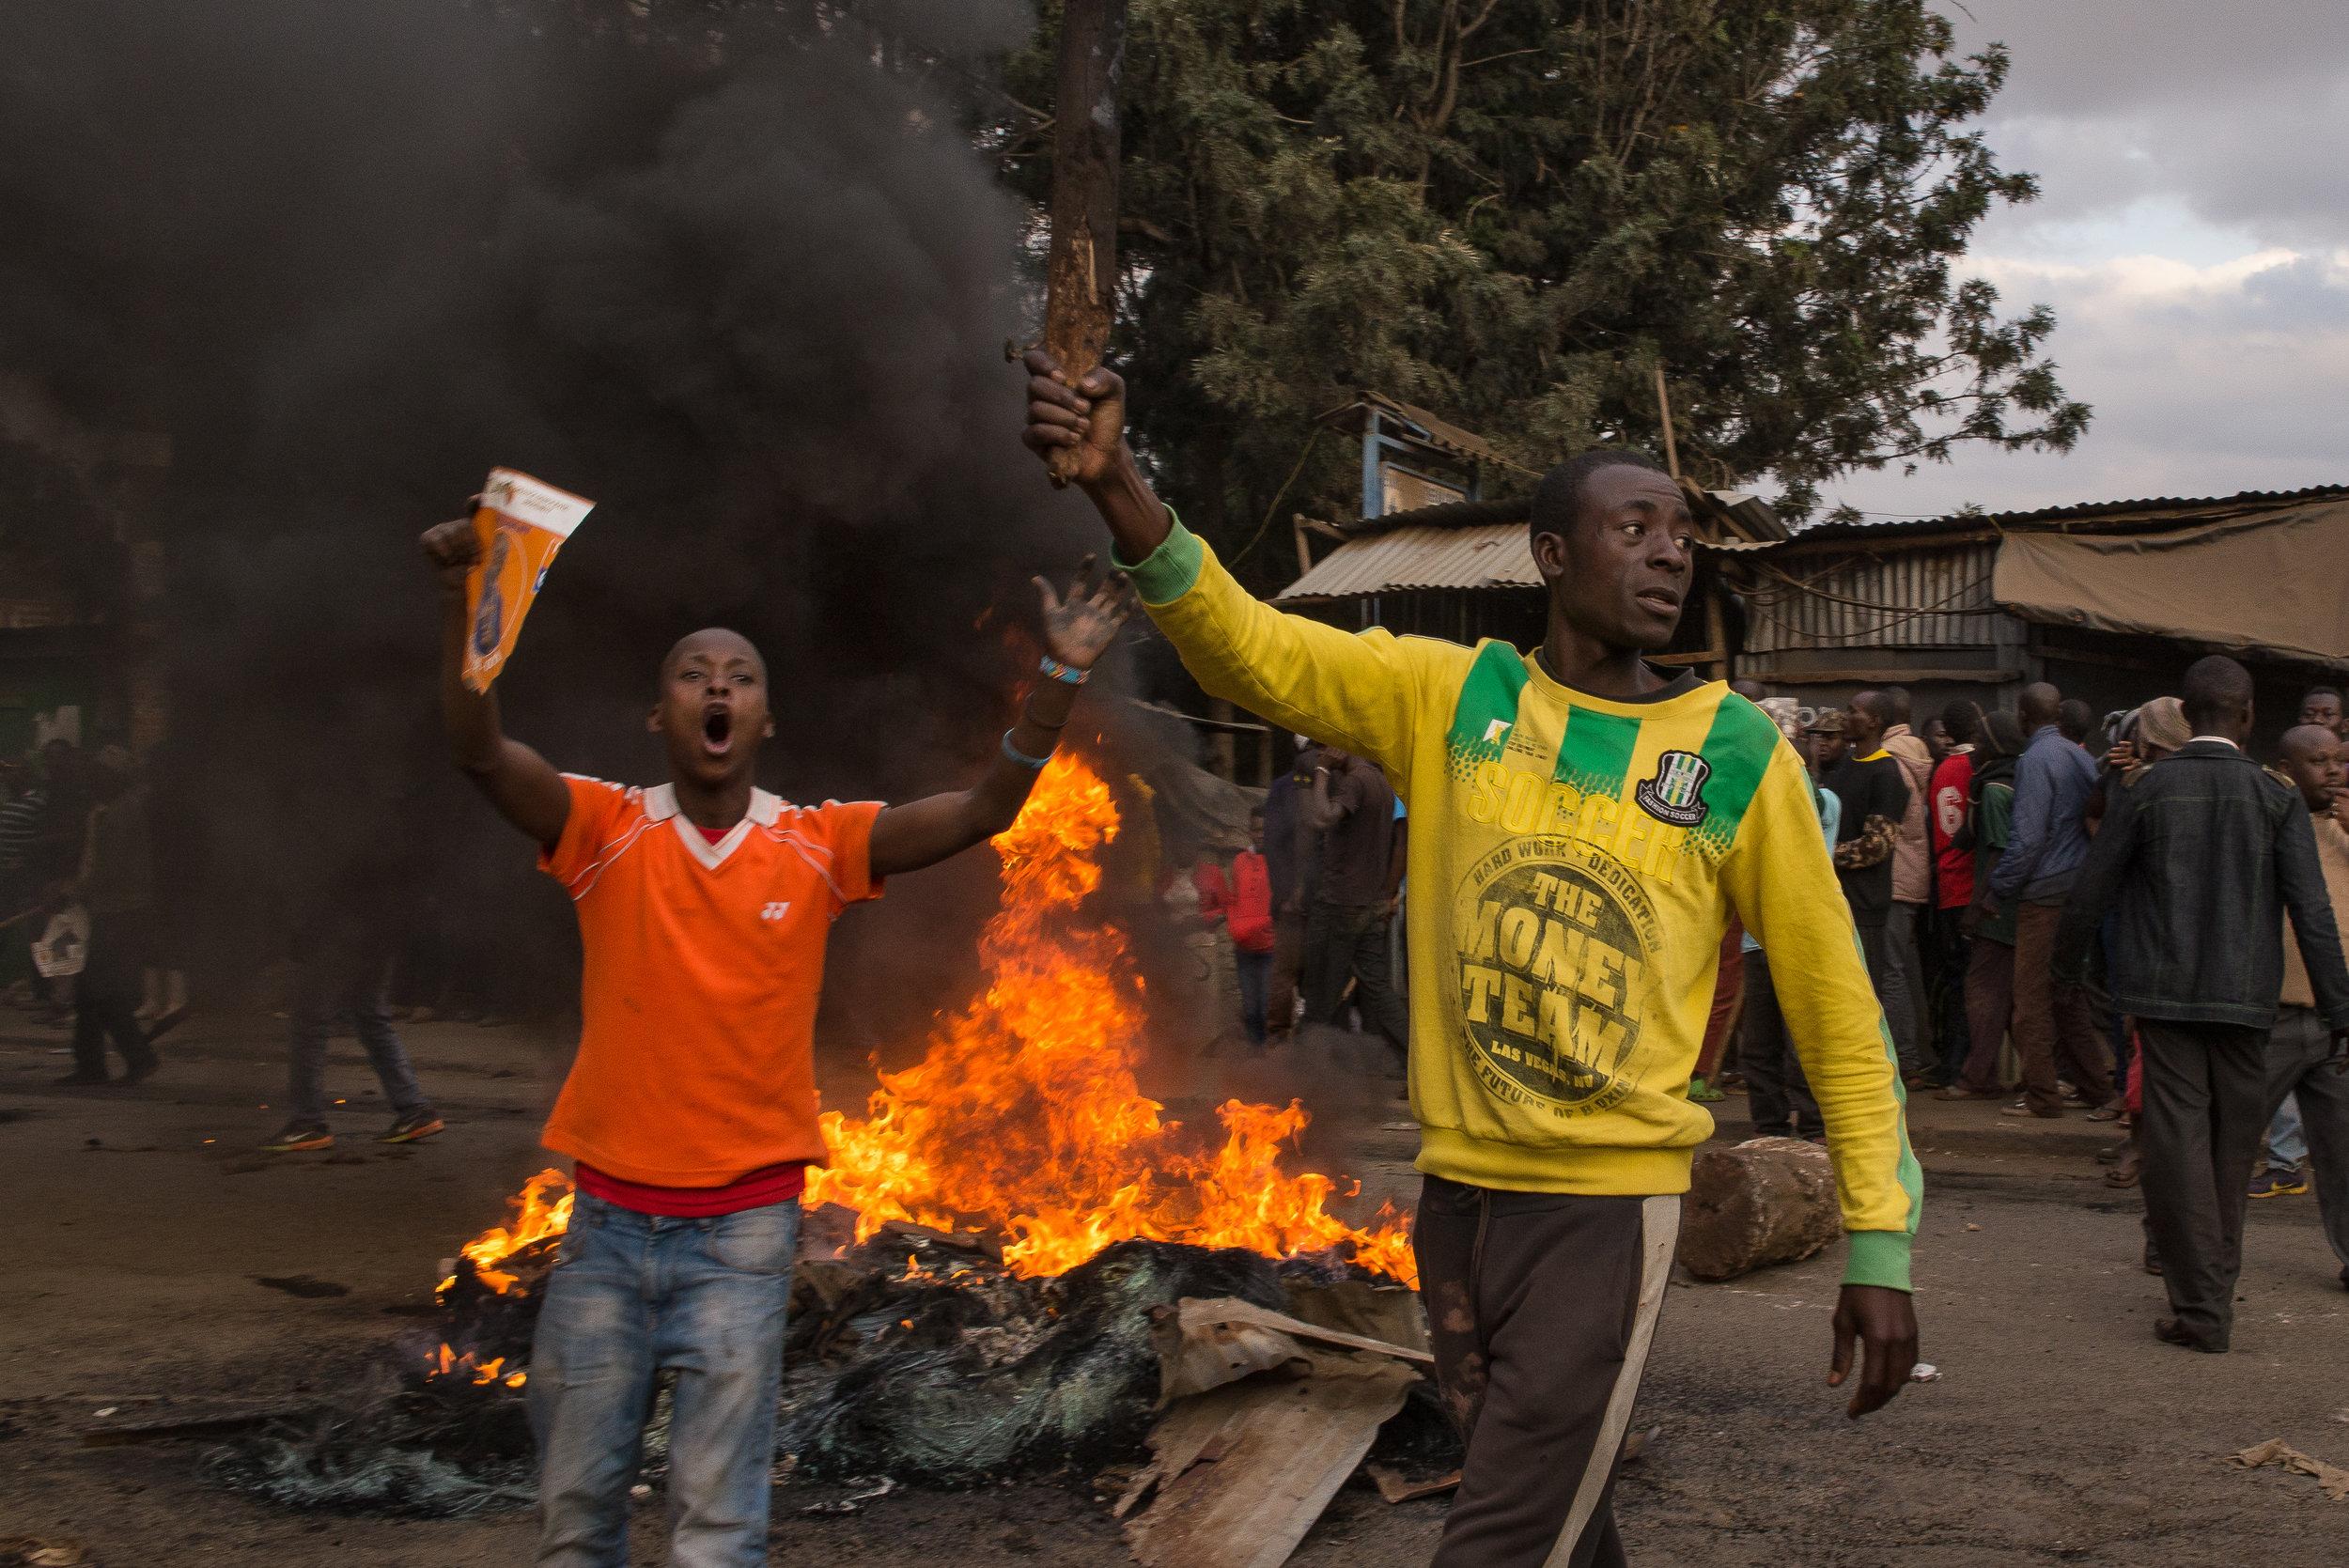 "Men yell ""Uhuru must go!"" during a demonstration in Kibera, an informal settlement of Nairobi, Kenya. Many of the residents support Raila Odinga of the National Super Alliance over current President Uhuru Kenyatta. Credit:Katie G. Nelson/PRI"